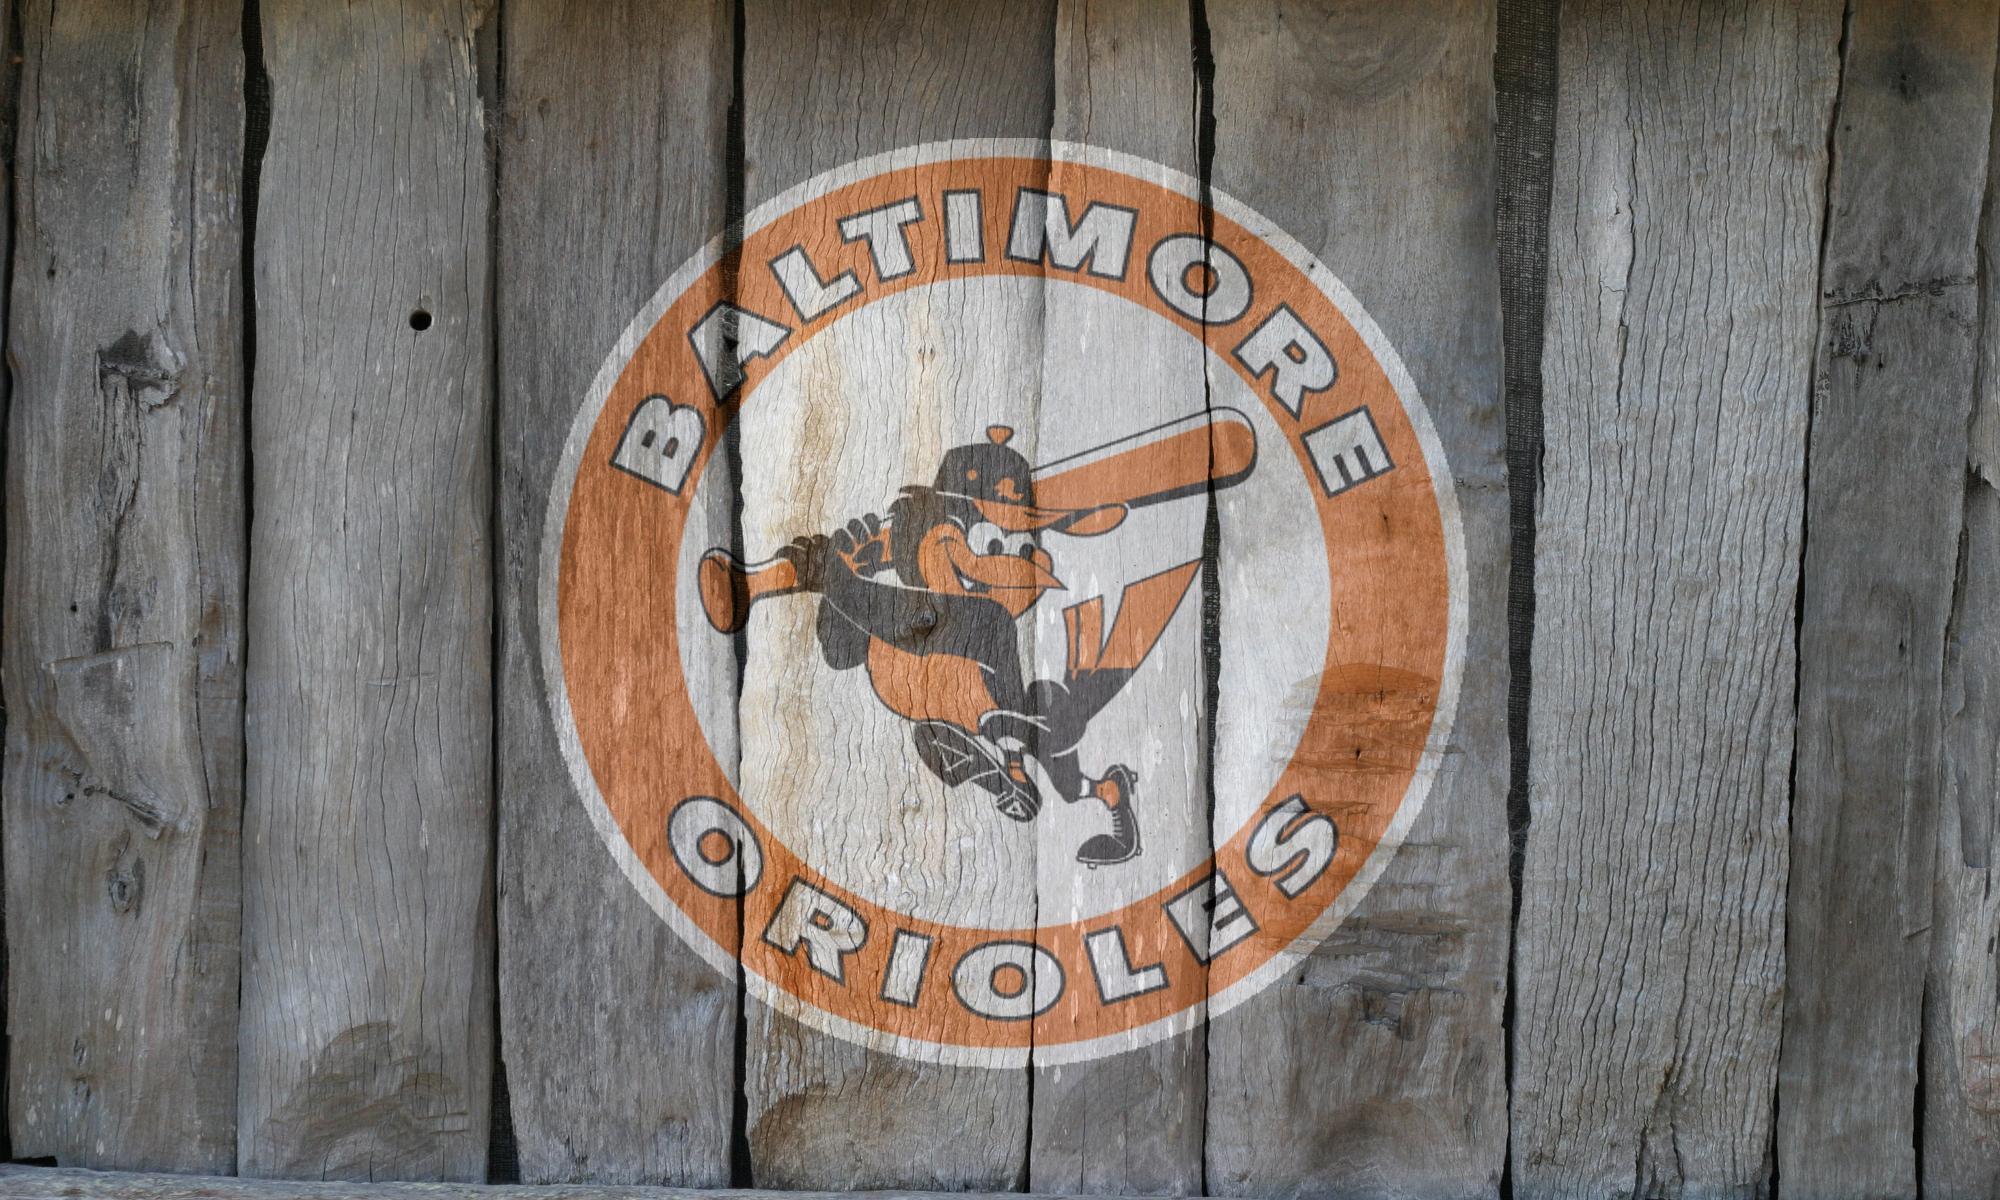 Baltimore Orioles Desktop Wallpaper Collection Sports Geekery 2000x1200